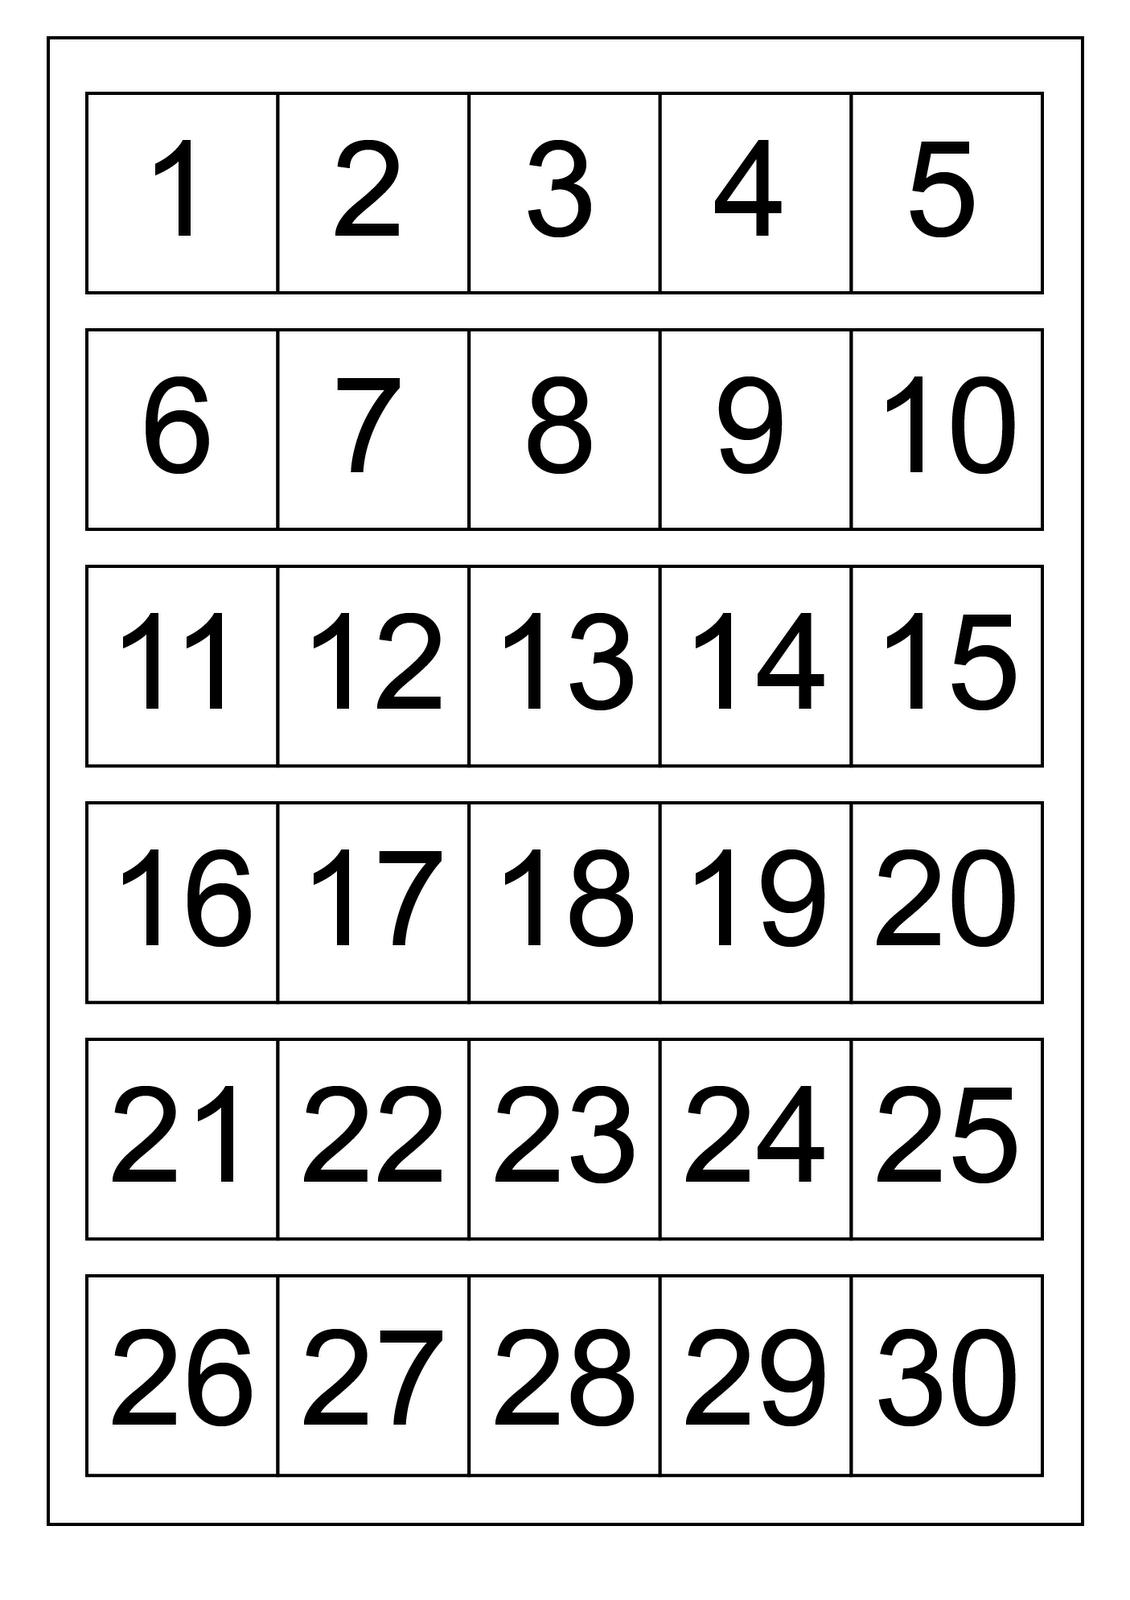 numbers 1-30 worksheet to learn